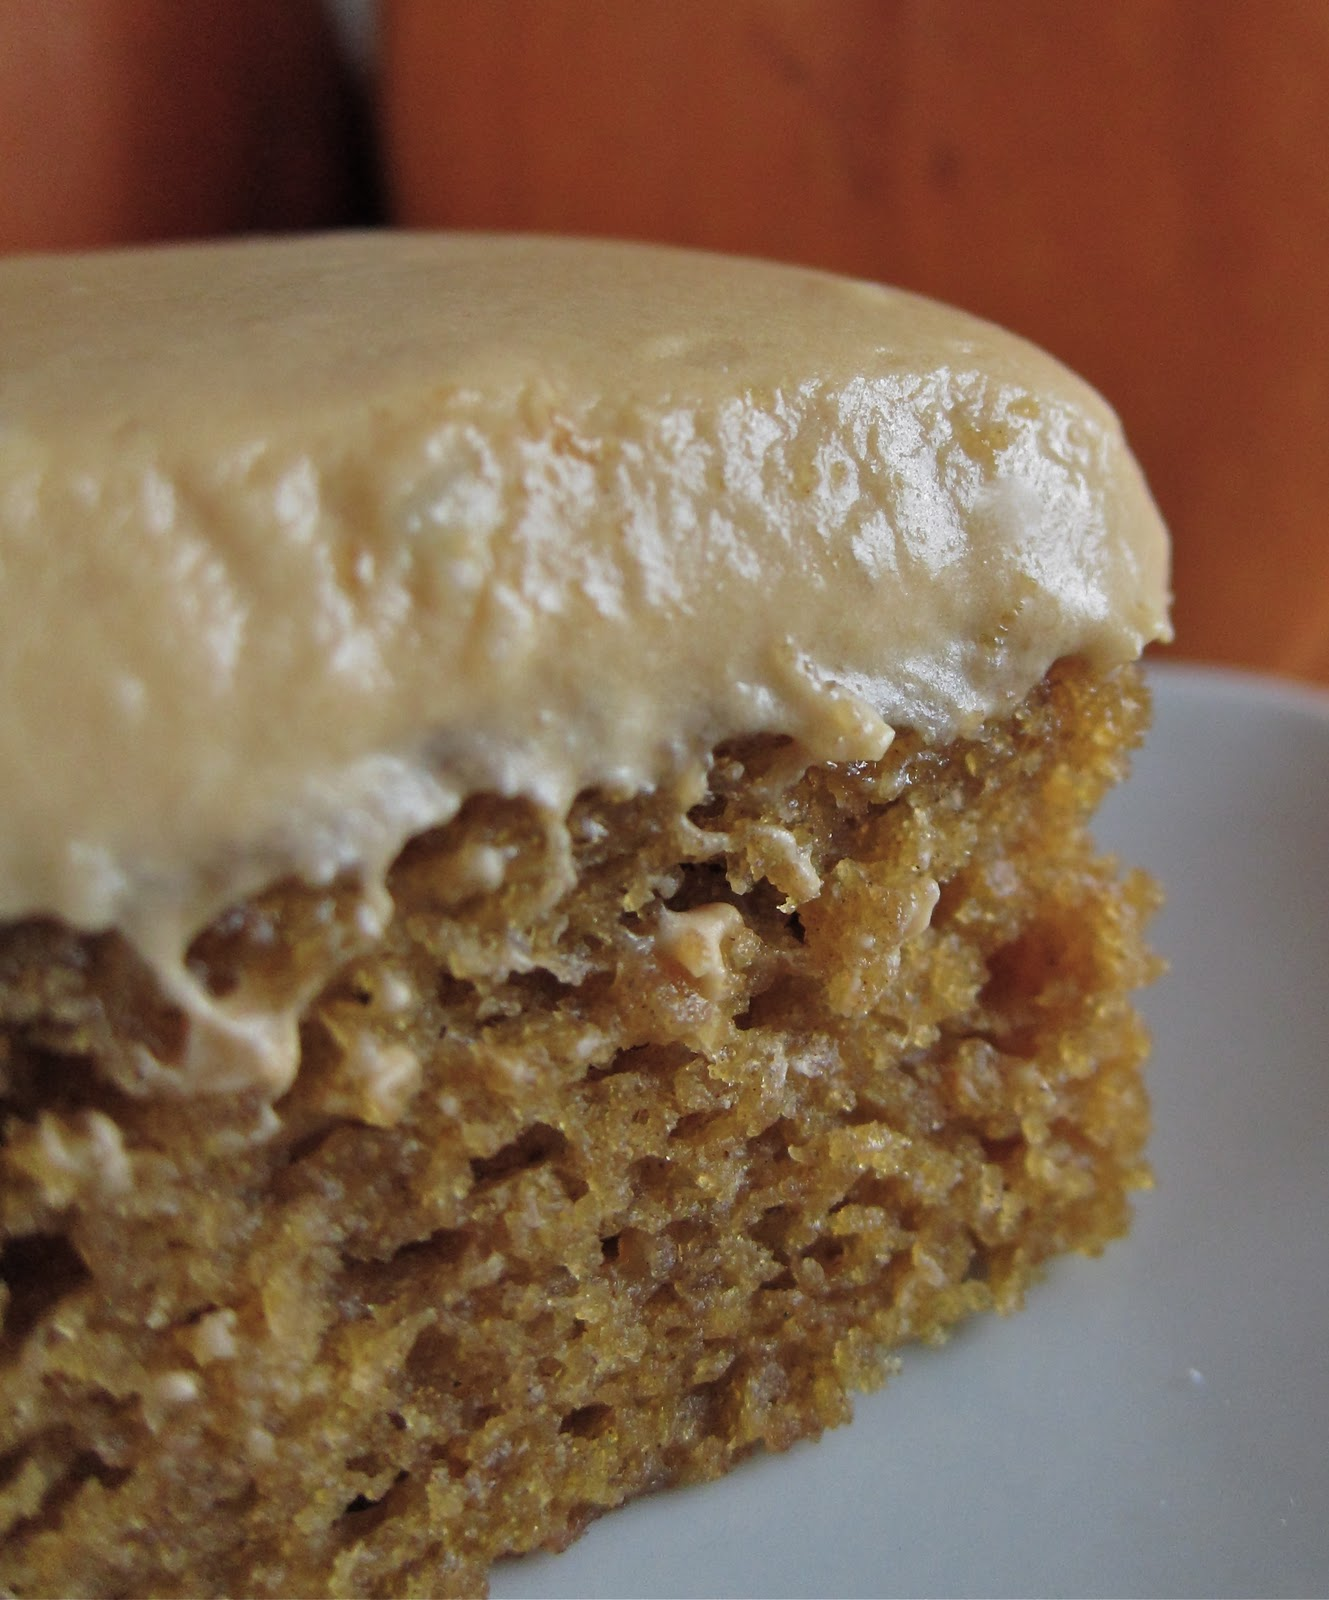 Arctic Garden Studio: Pumpkin Cake with Dulce de Leche Icing